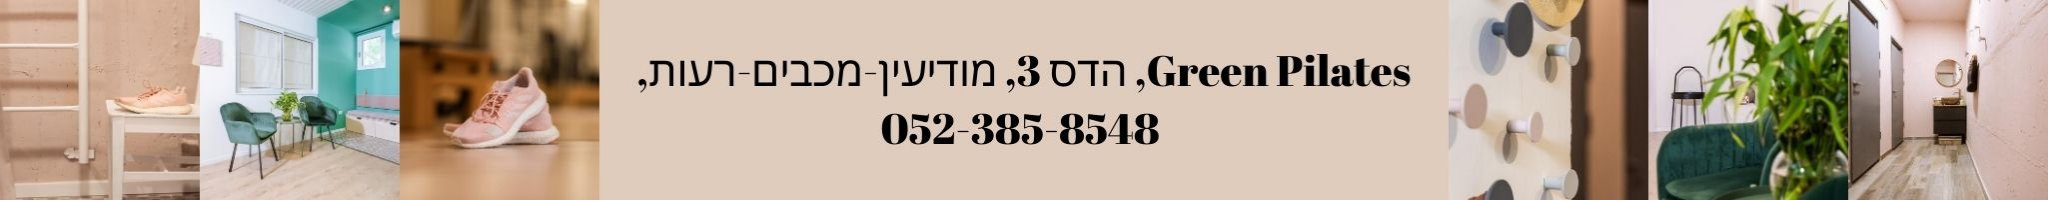 Green Pilates, הדס 3, מודיעין-מכבים-רעות, 052-363-4598